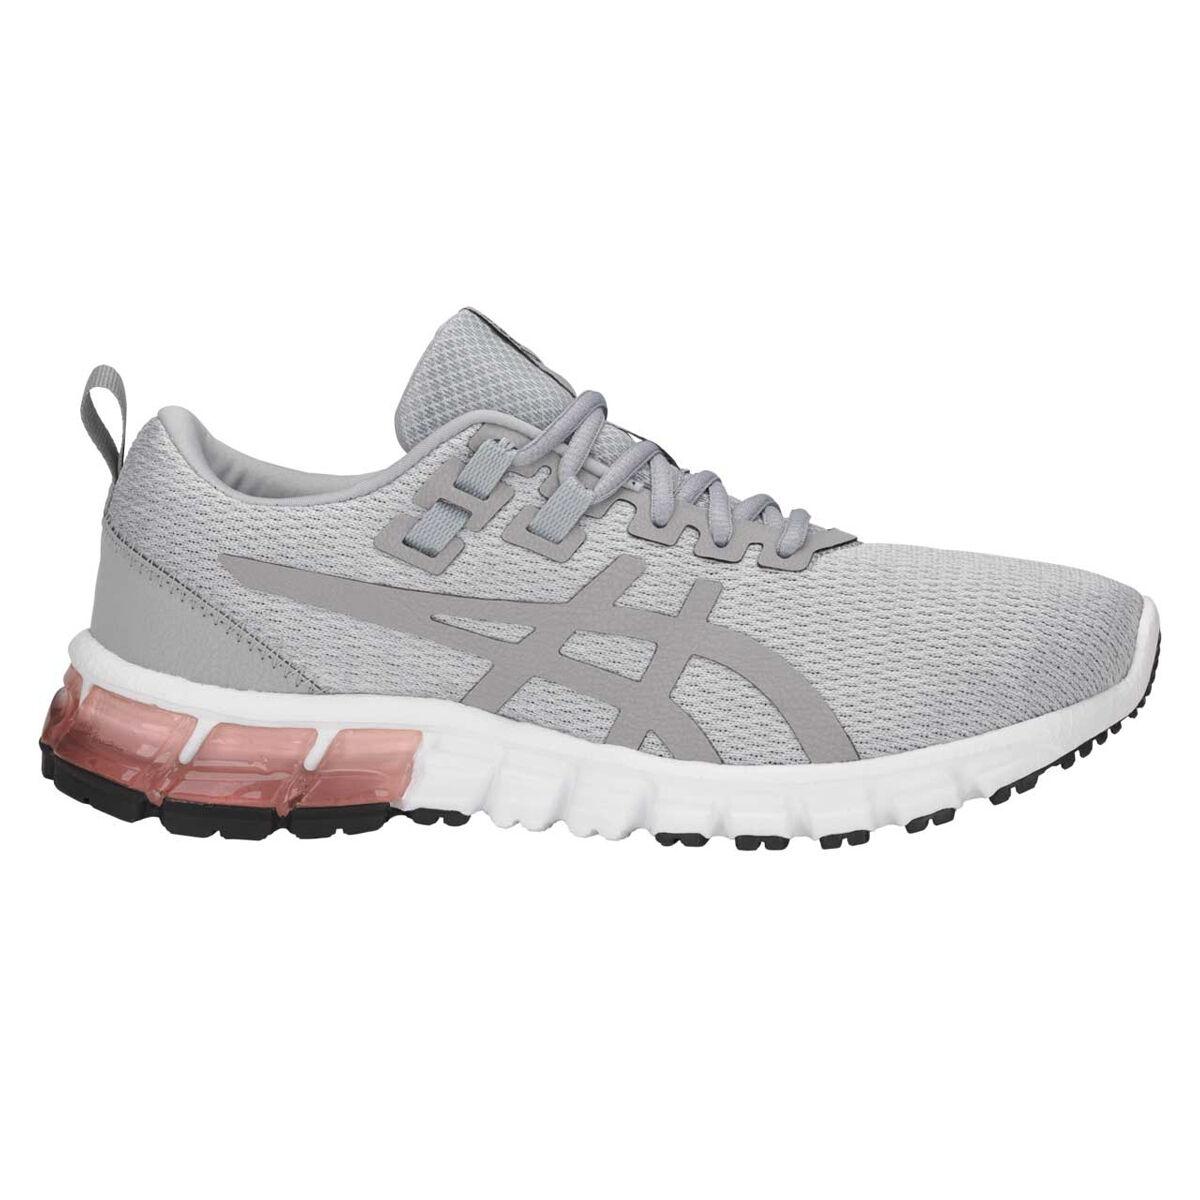 shoes mizuno usa jd grey